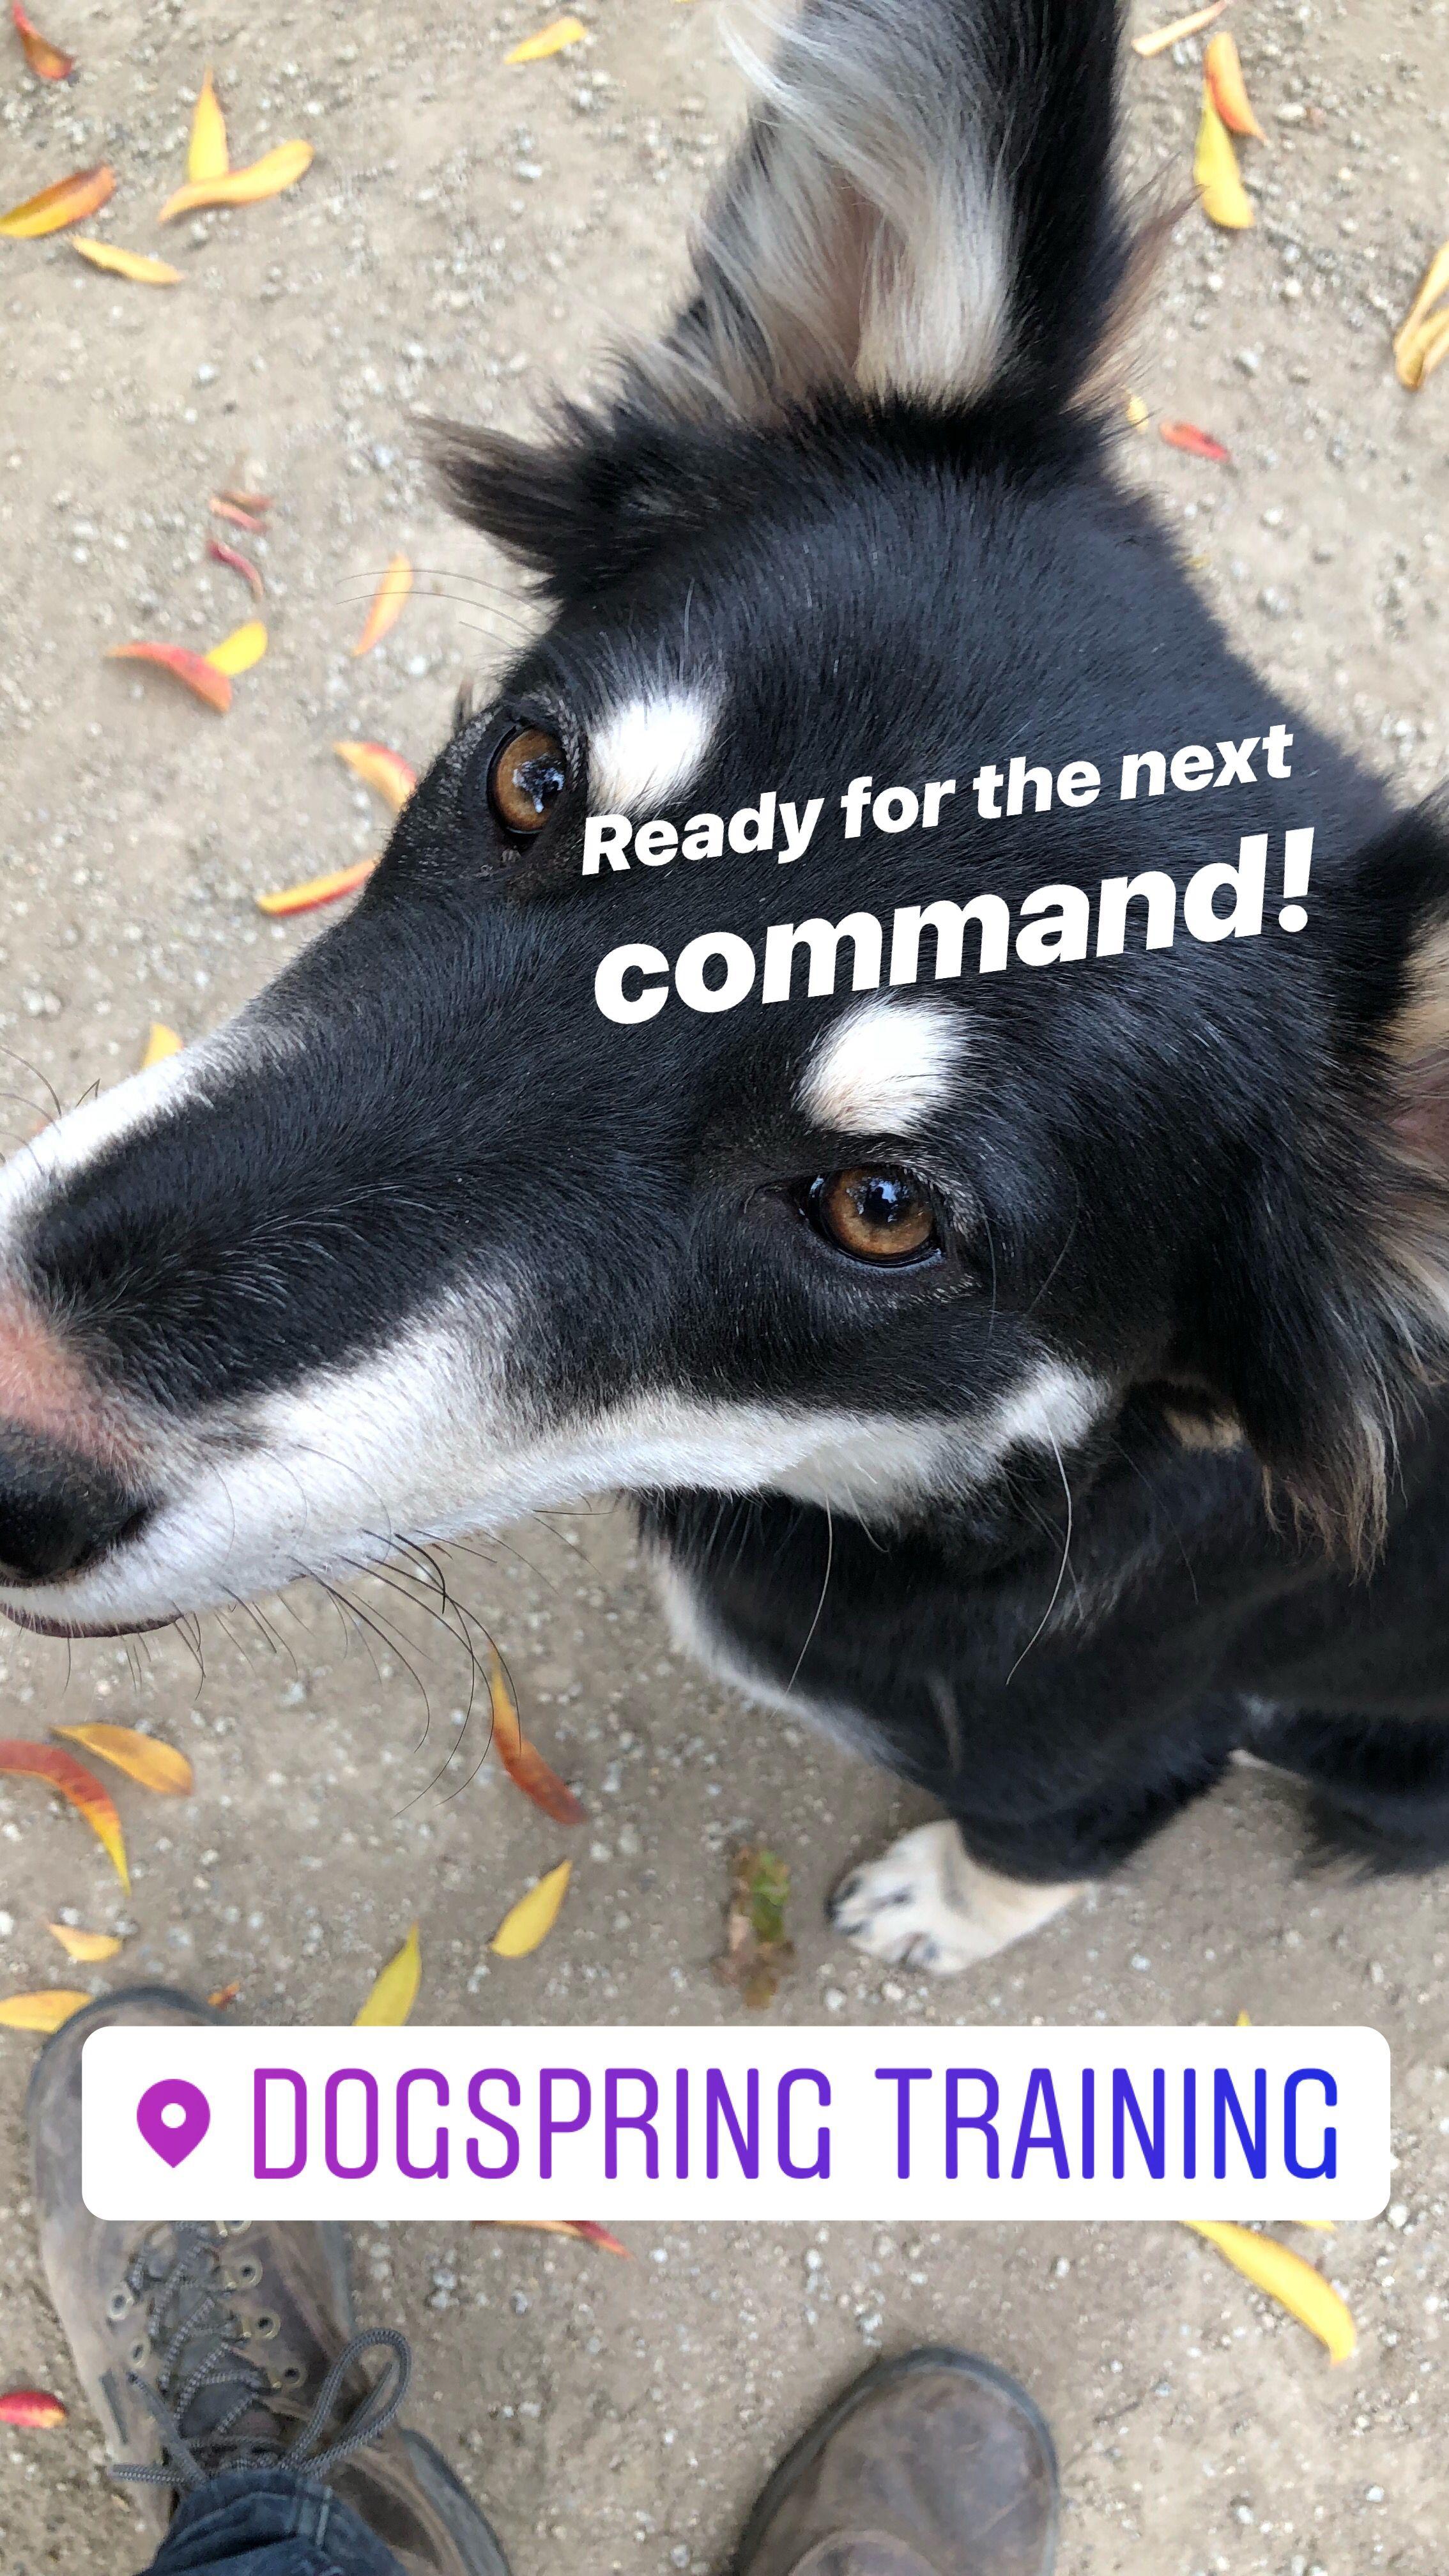 How Long Will It Take To Train My Dog Dog Training Dog